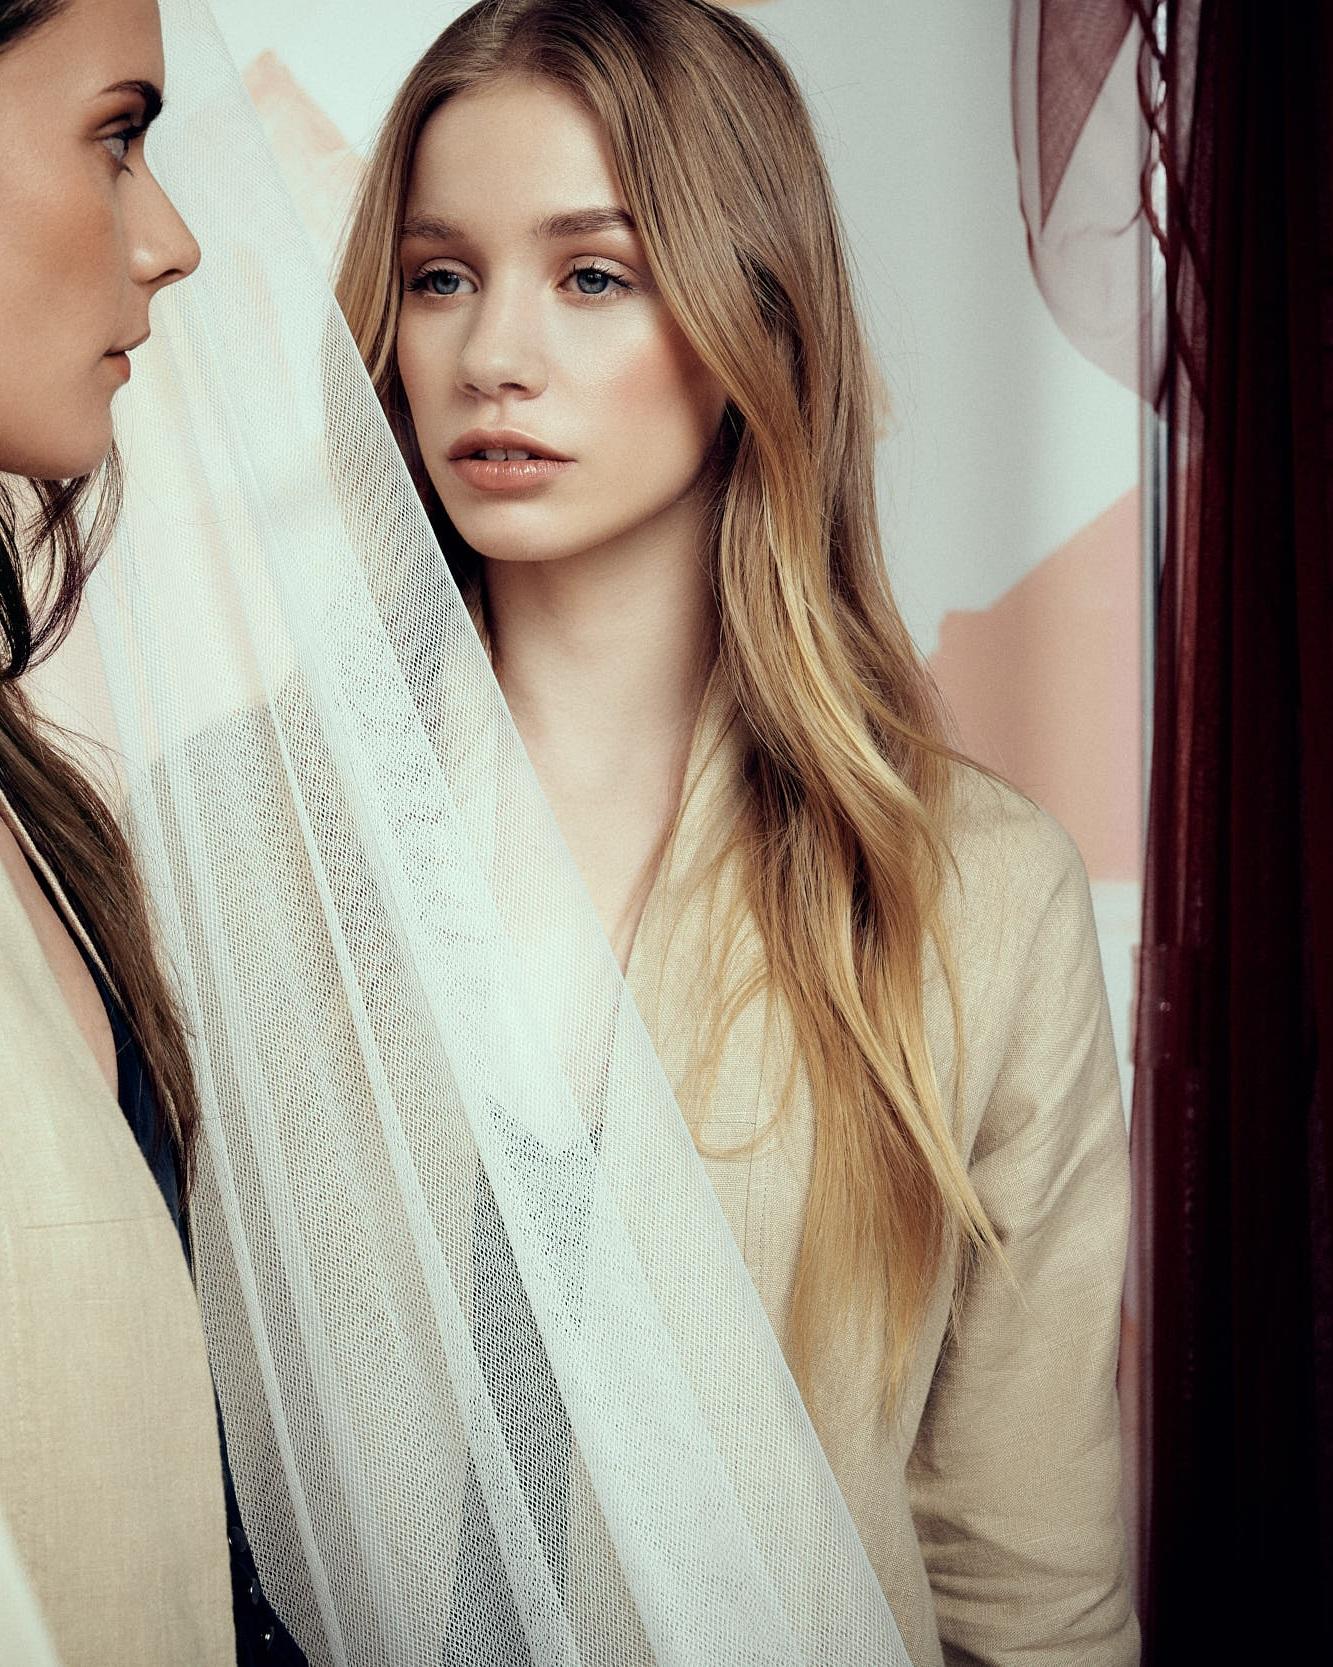 Joe Friend Photography | Fashion Photography | John Taylor